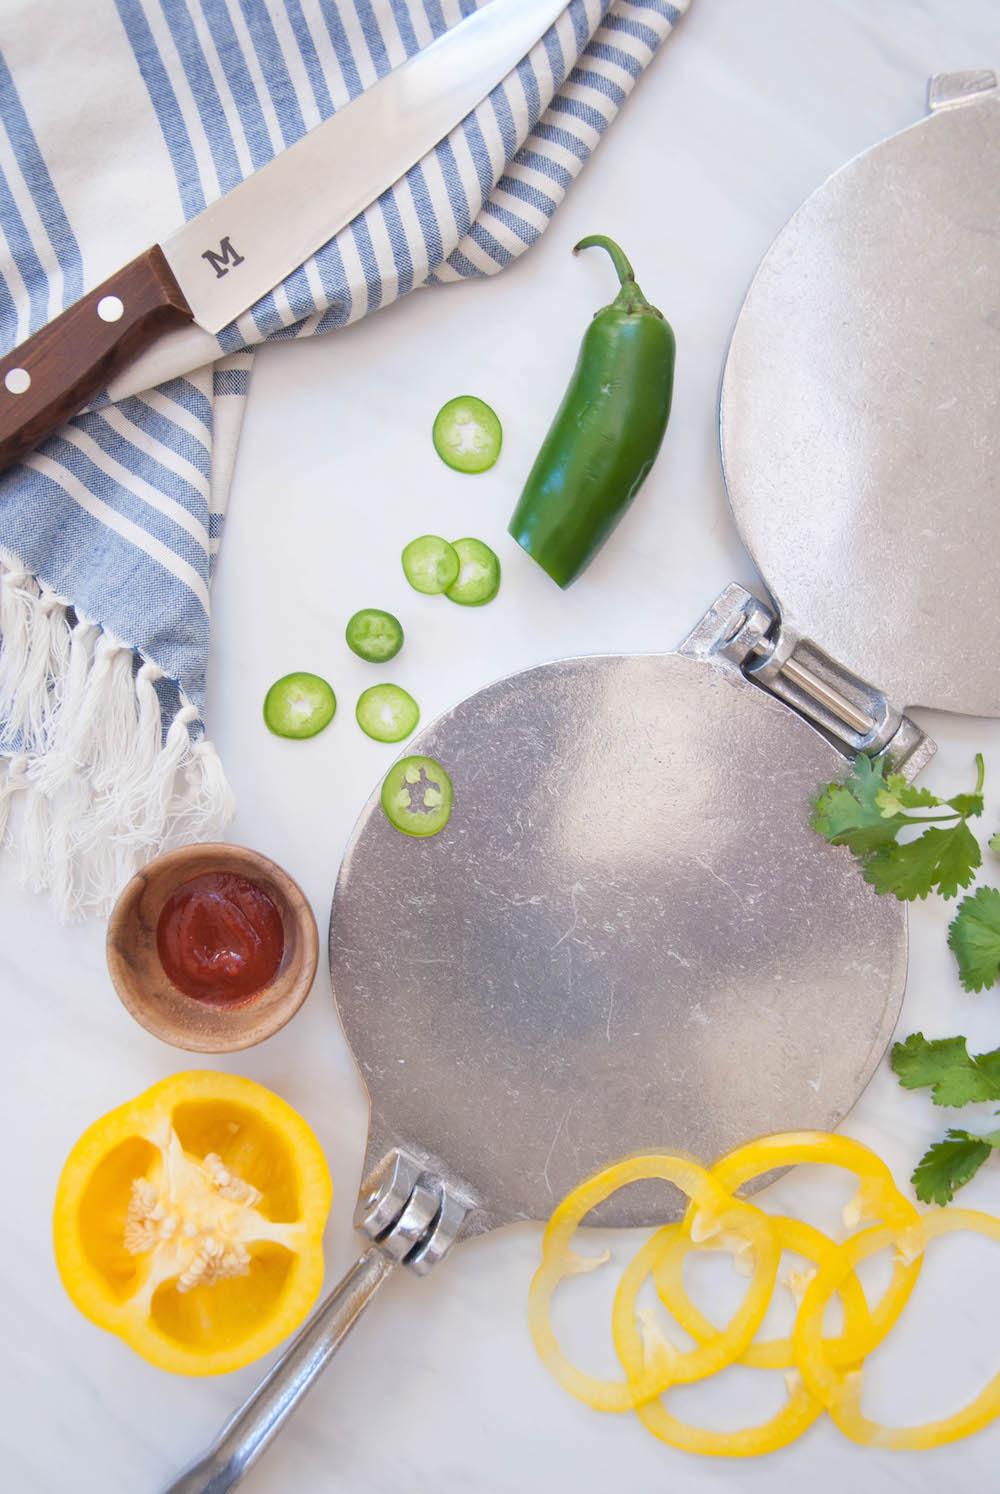 Flavor Pressed & Patterned Homemade Tortillas